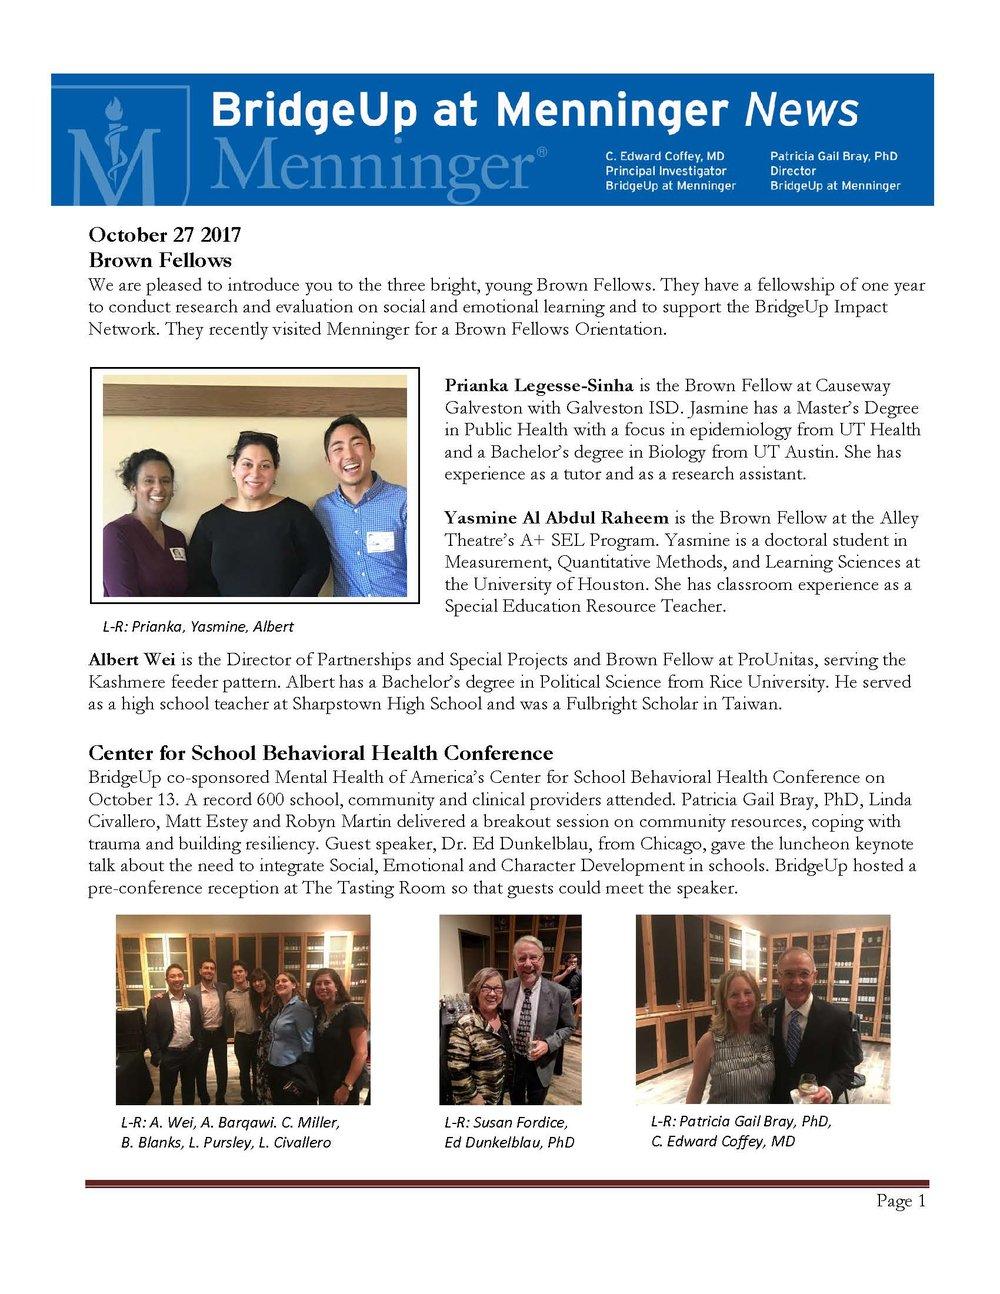 BridgeUp at Menninger Fellows 2017 10 27.jpg